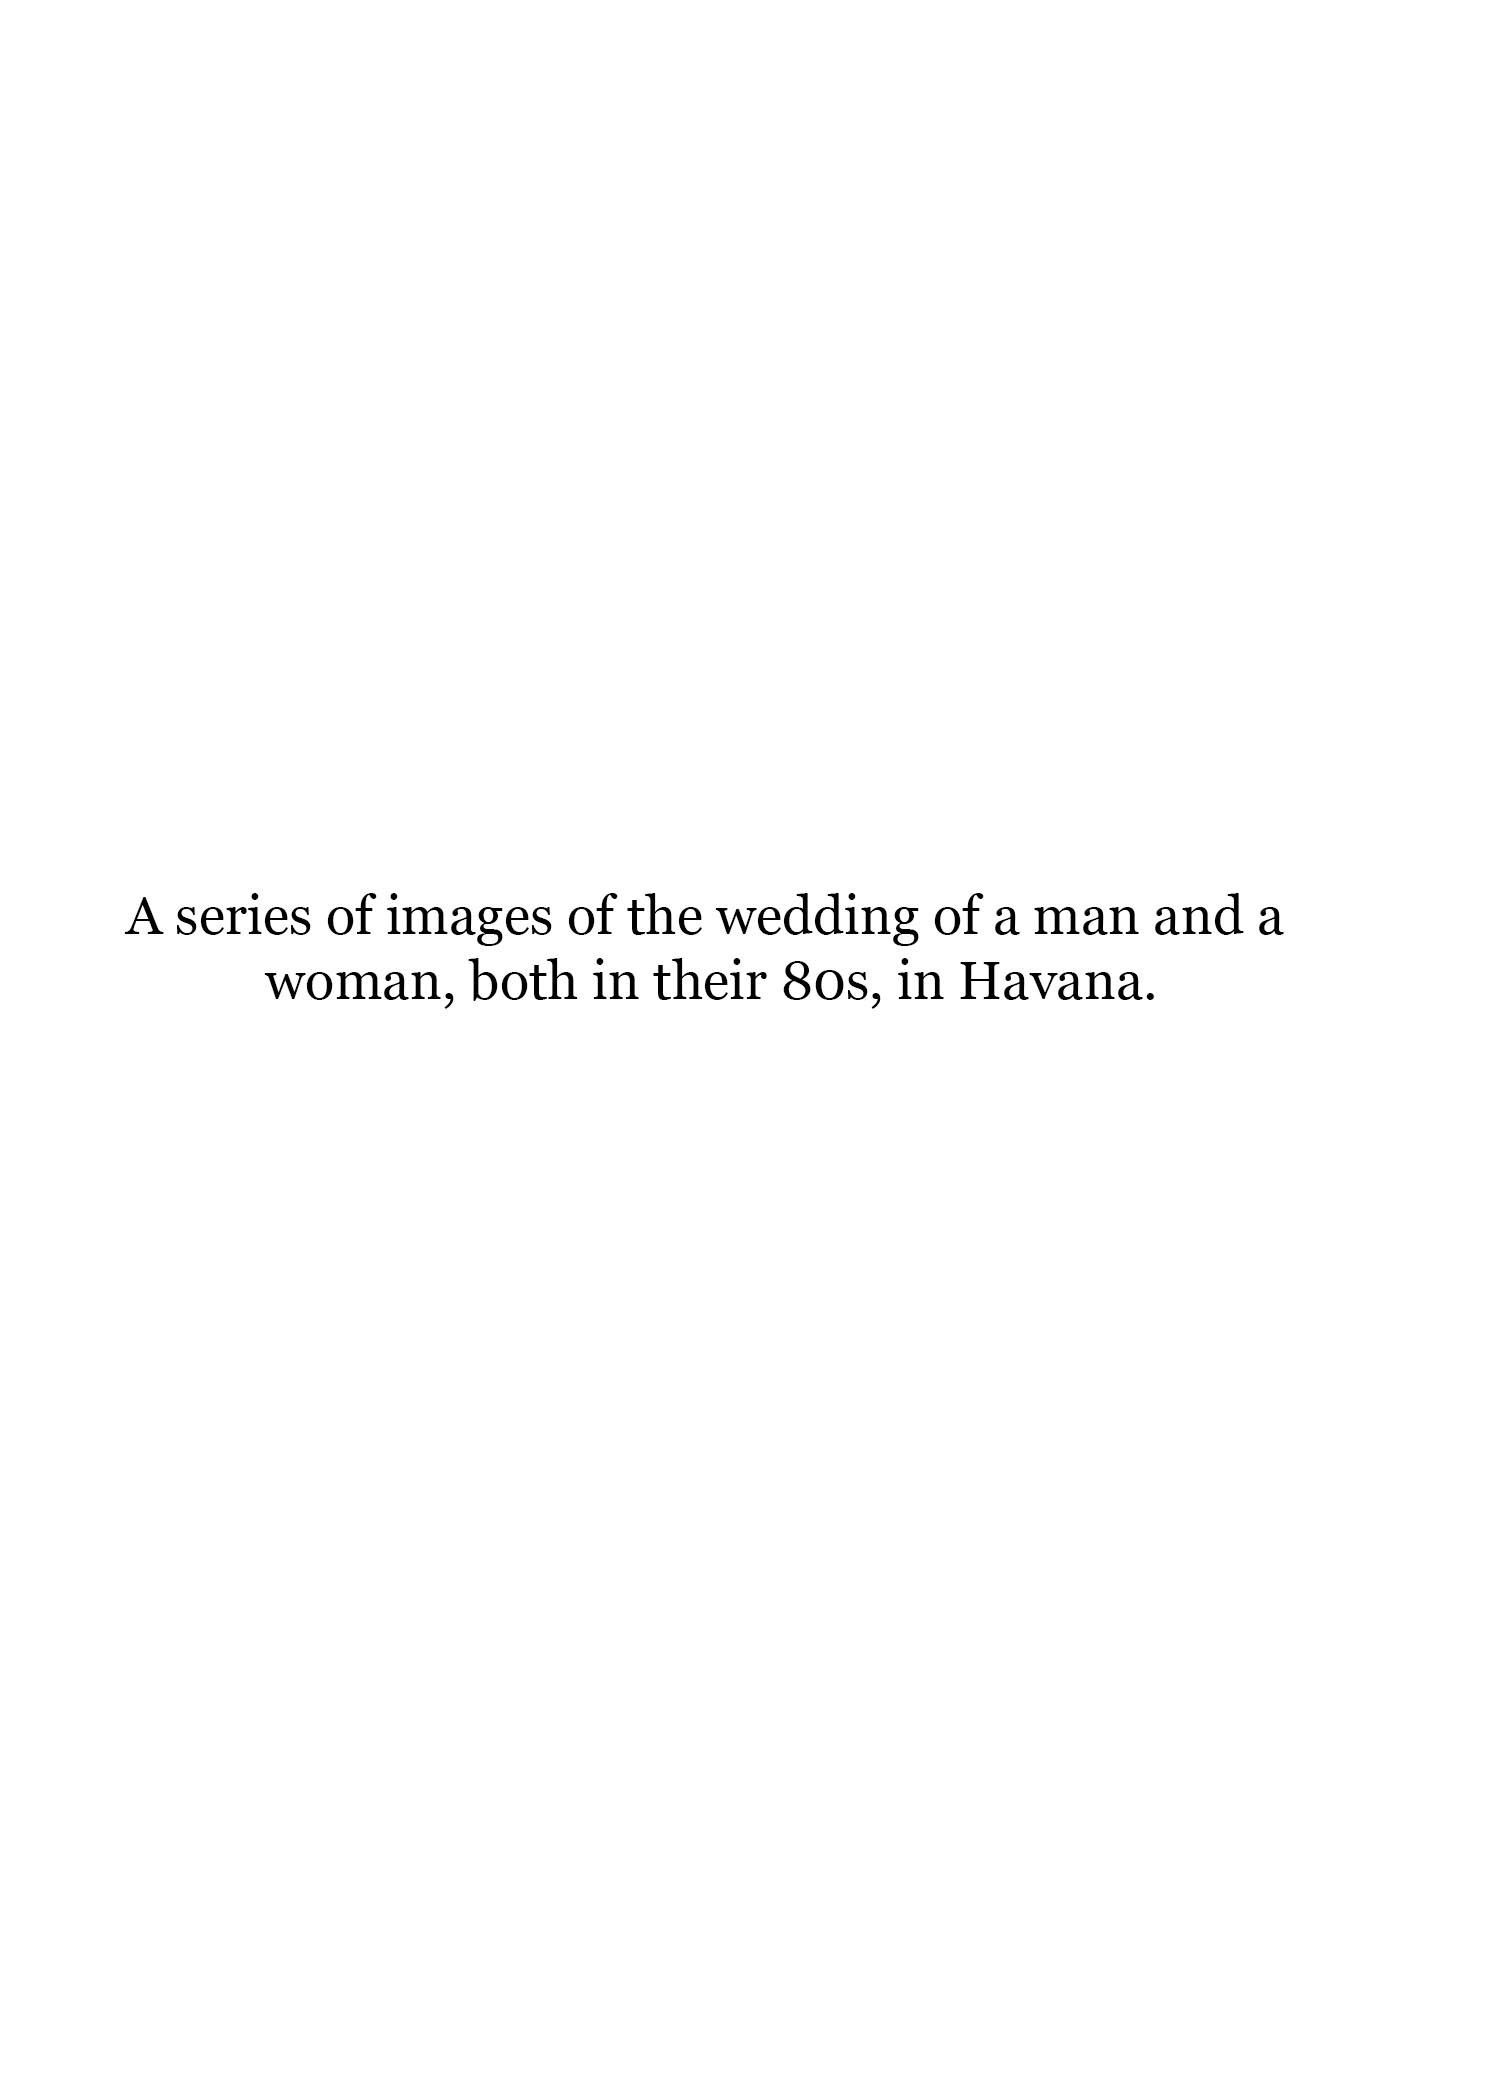 wedding description.jpg